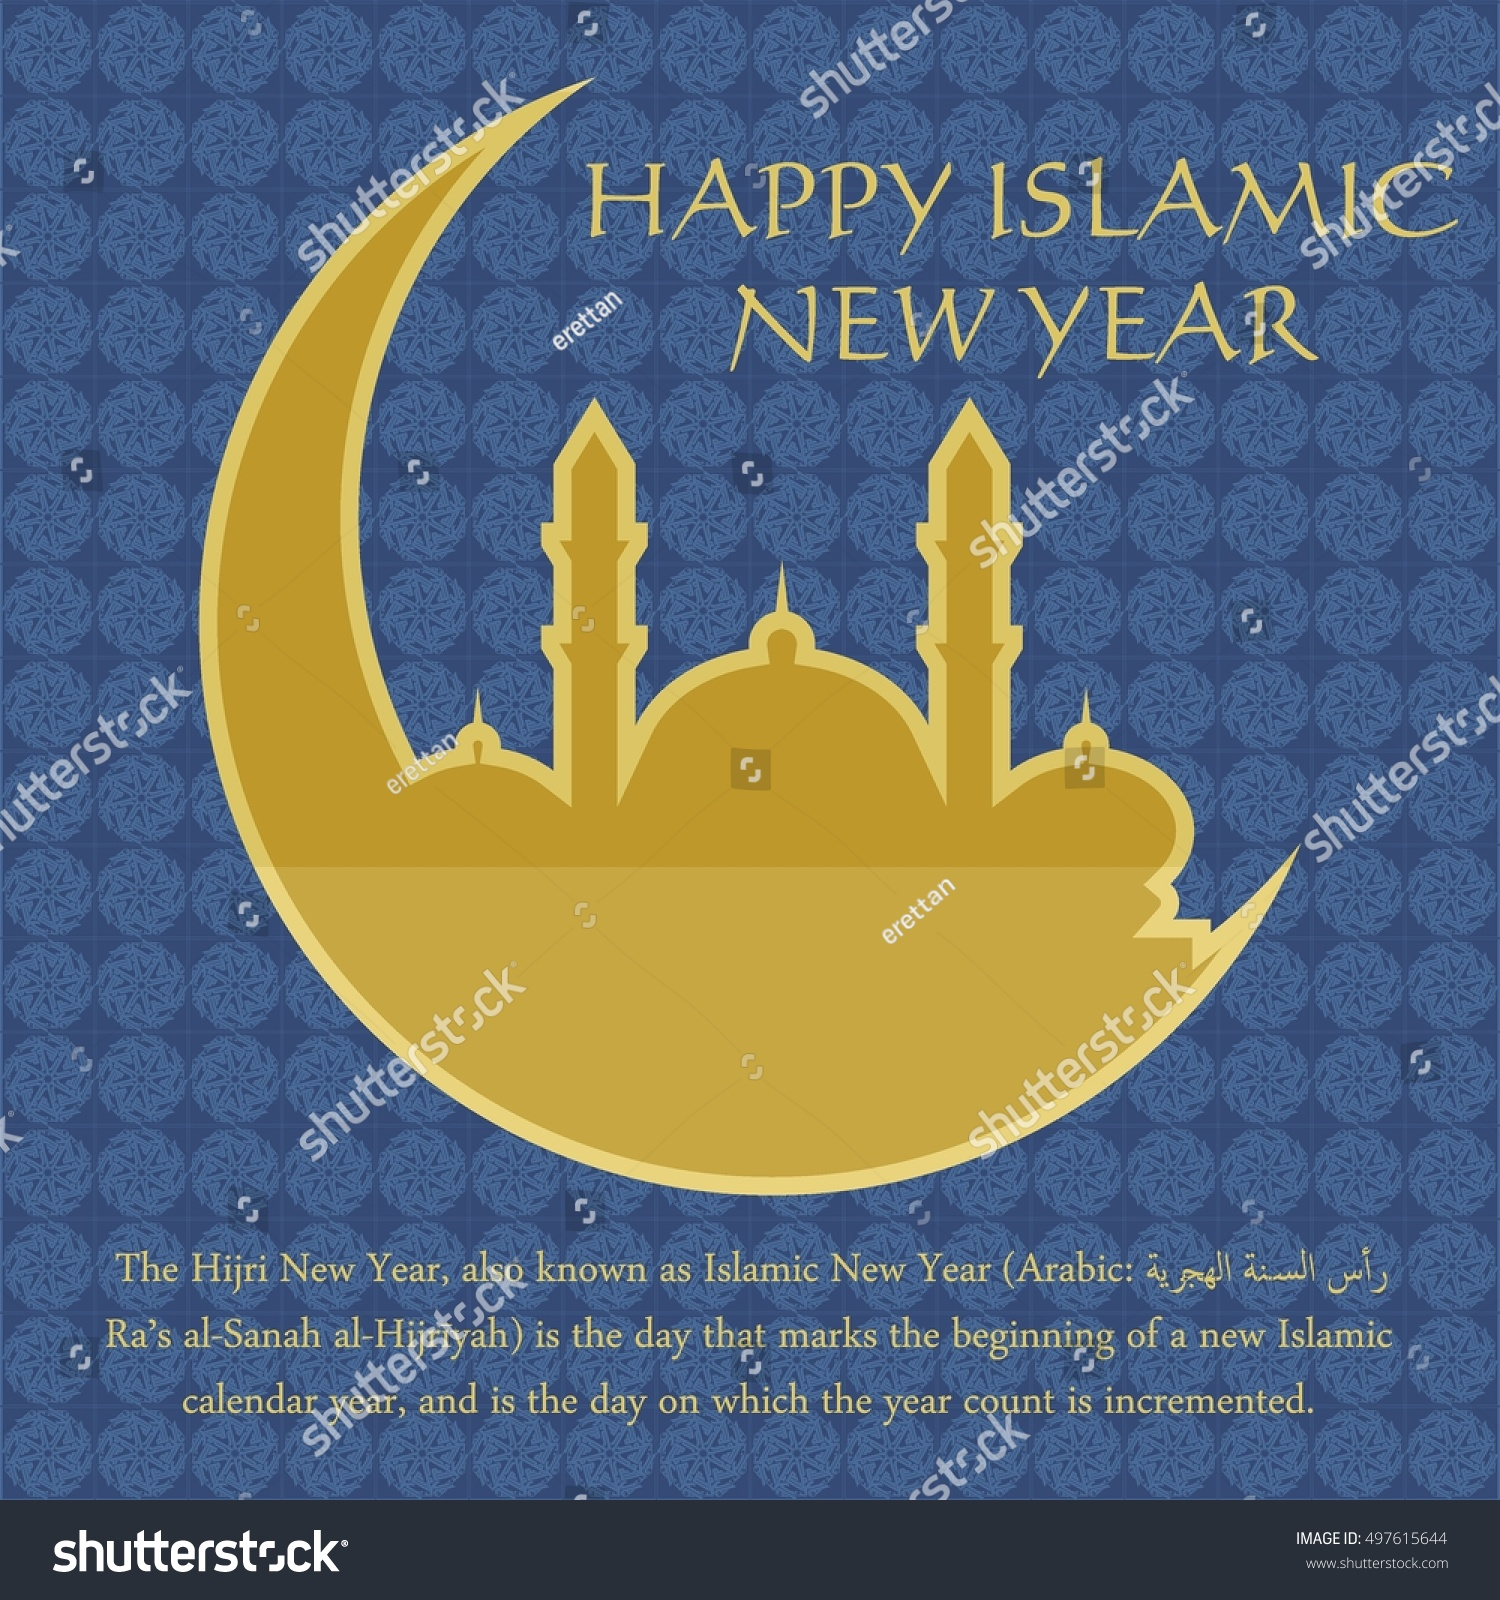 Islamic new year poster islamic card stock vector 497615644 islamic new year poster islamic card design template kristyandbryce Images